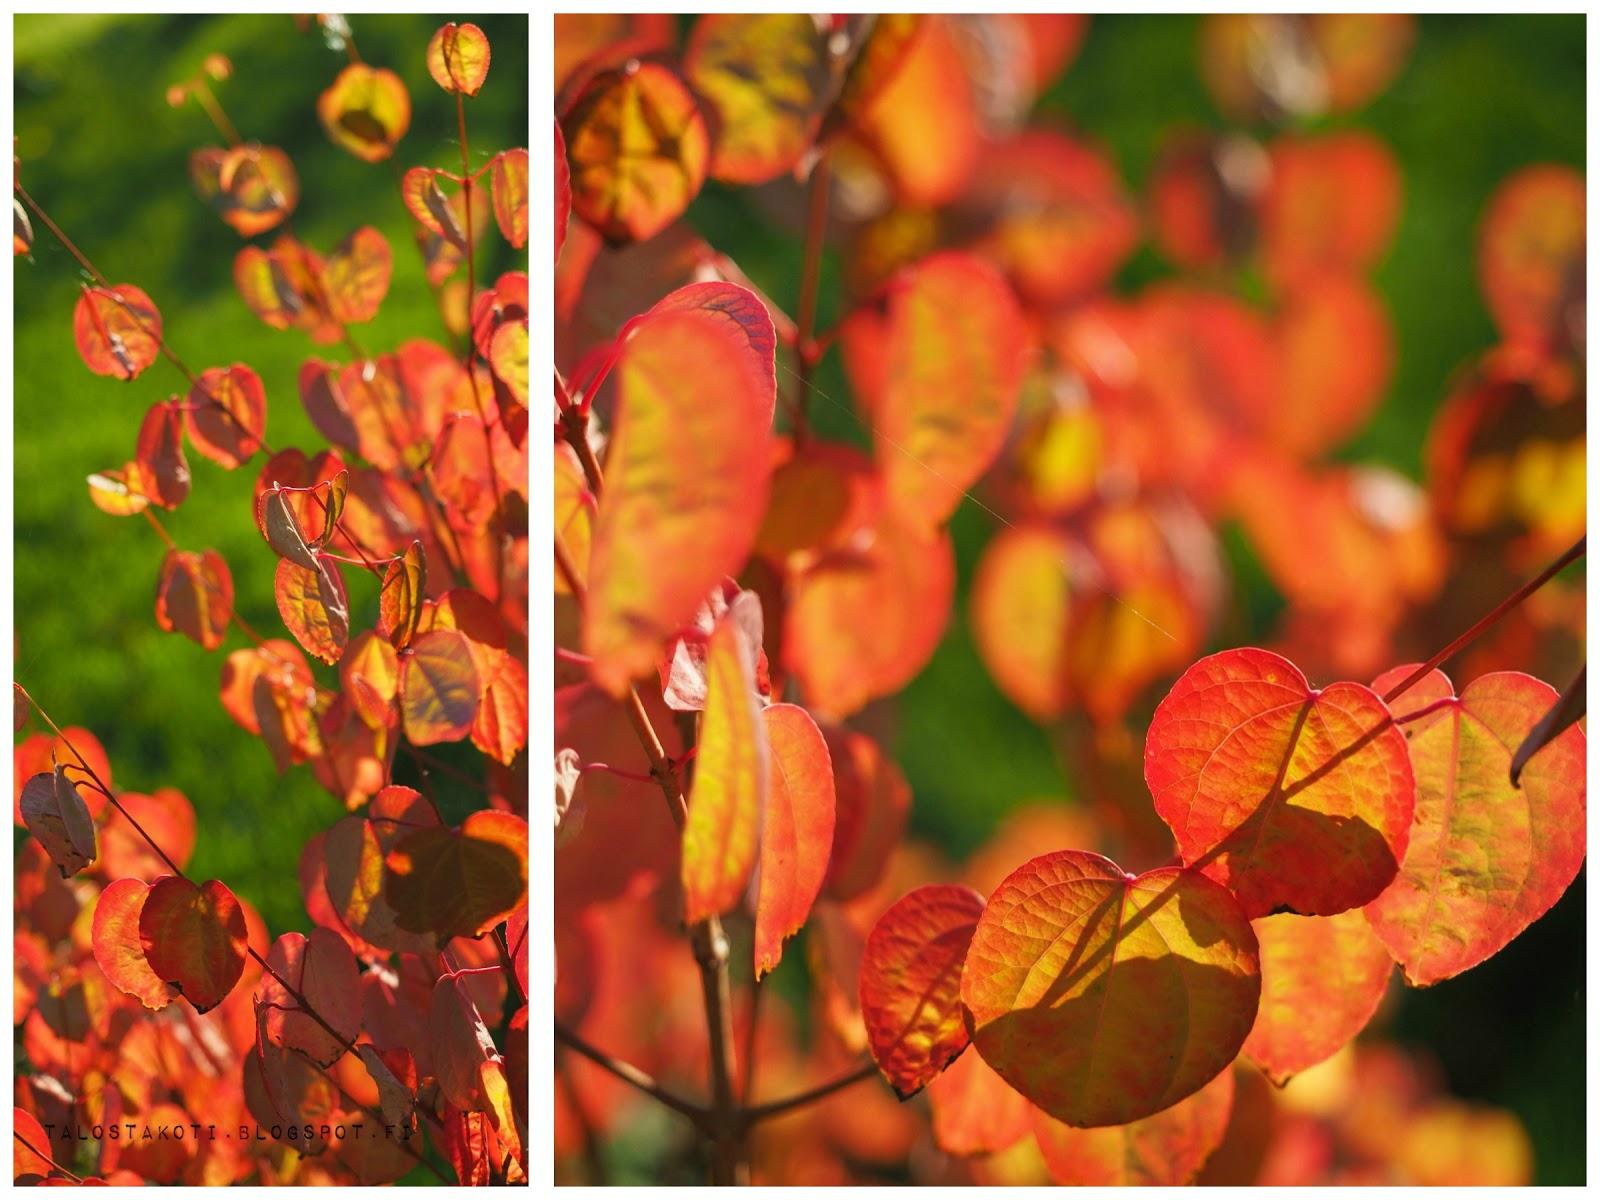 Katsura, puutarha, ruska, värikäs